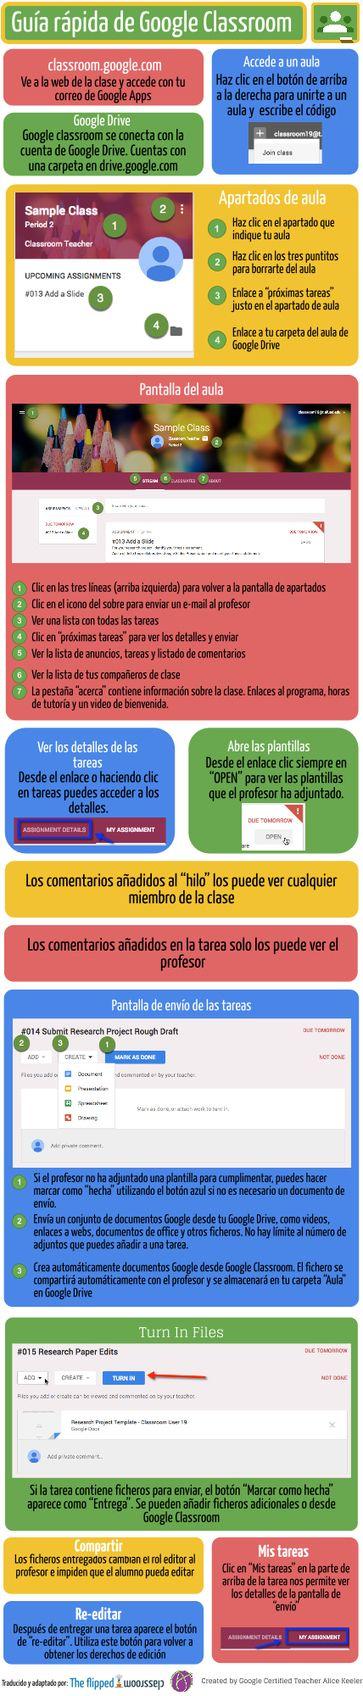 Guía rápida de Google Classroom #infografia #infographic #education | TICs para…